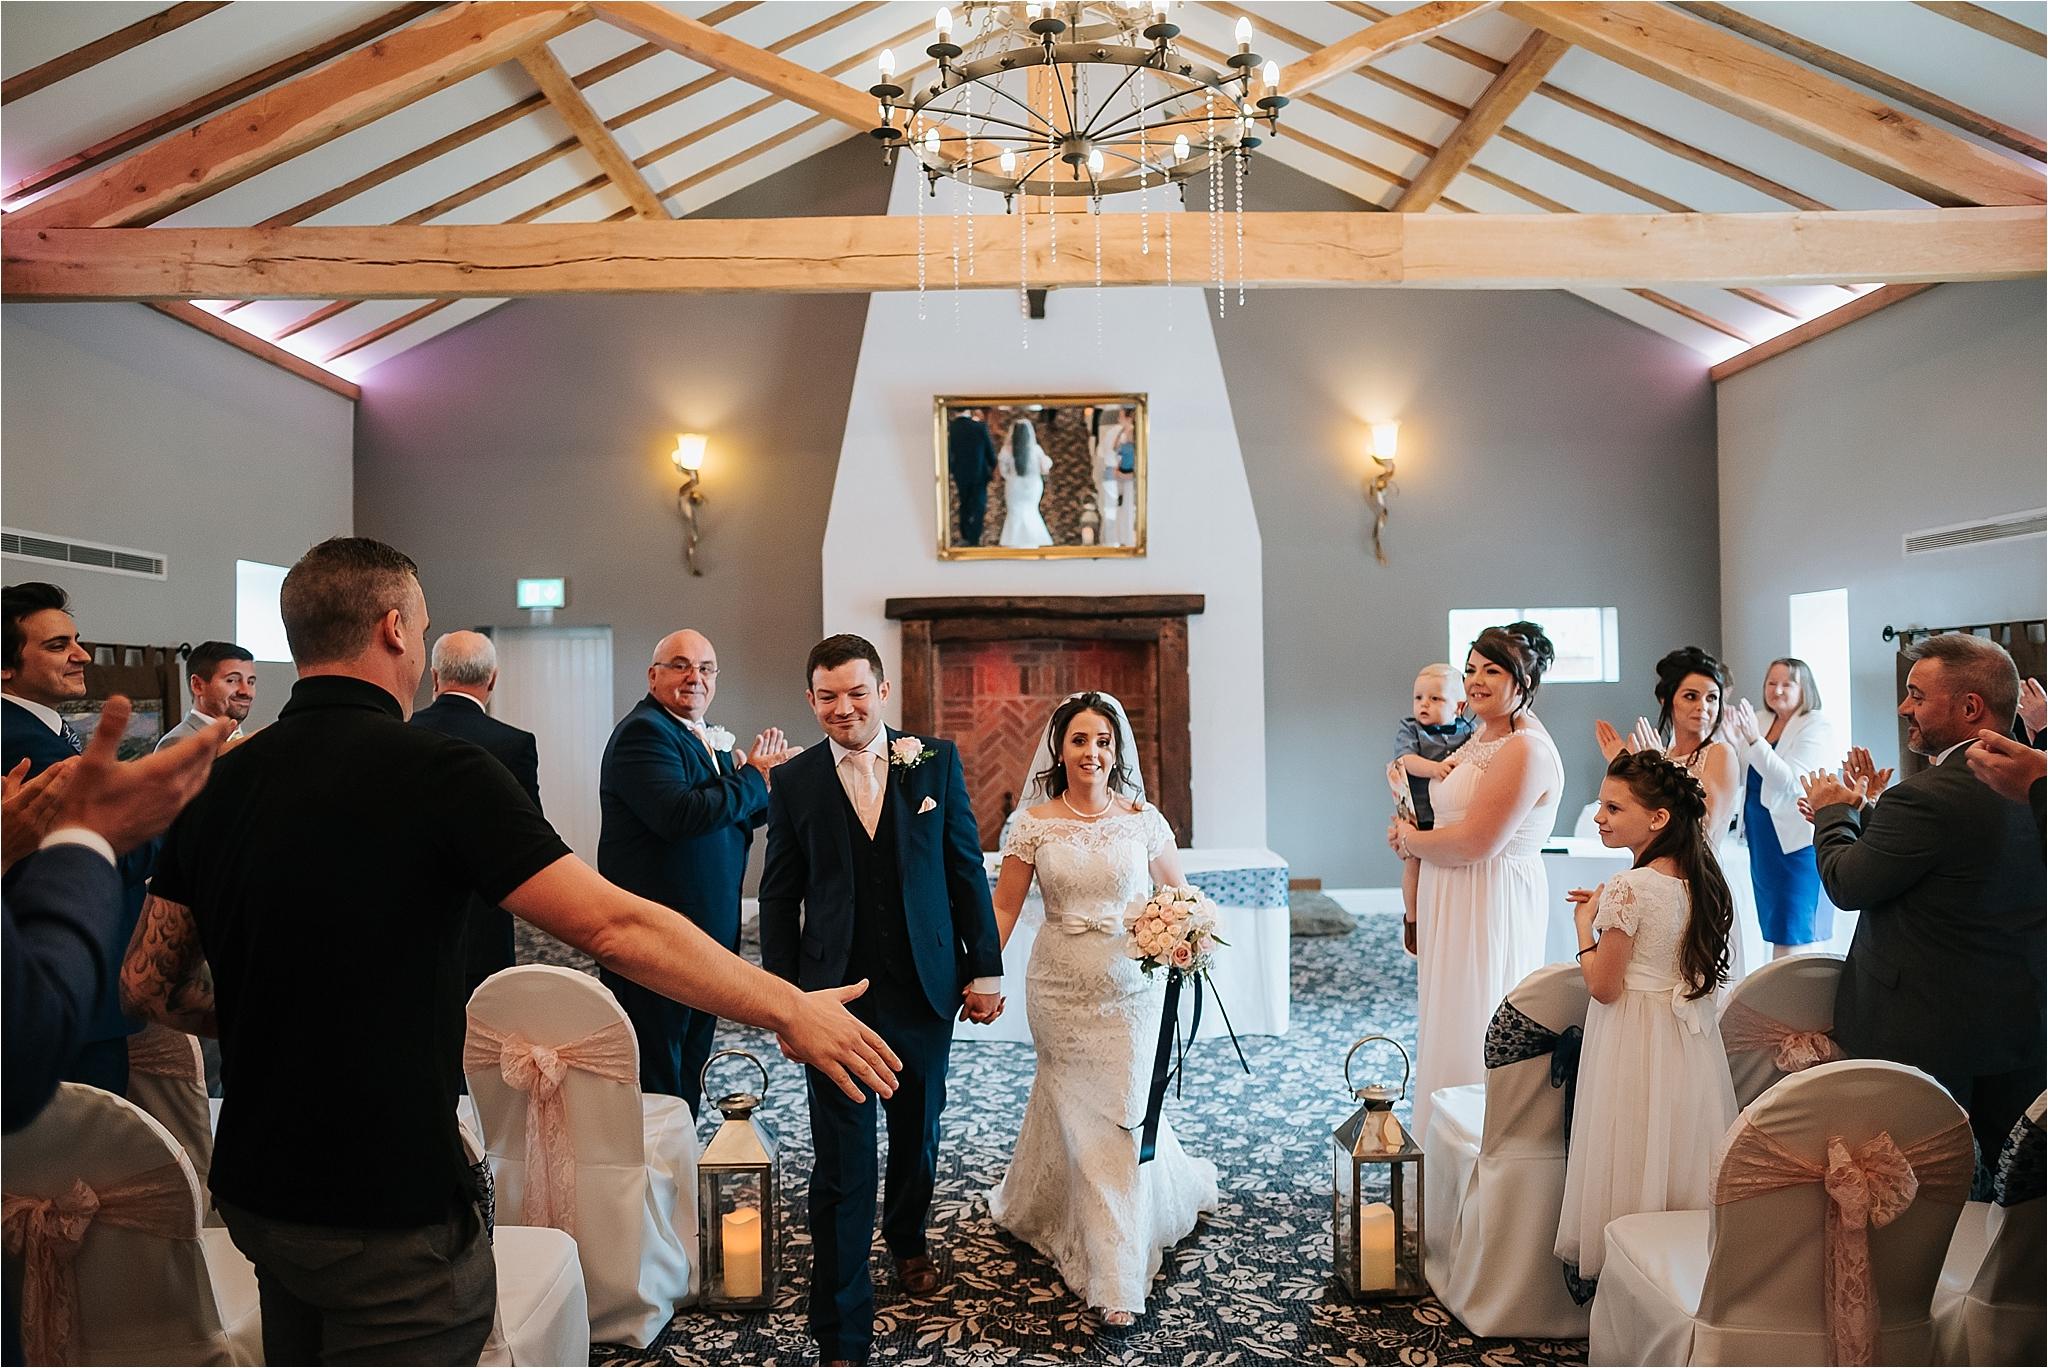 thevilla+lancashire+wreagreen+wedding+photographer98.jpg